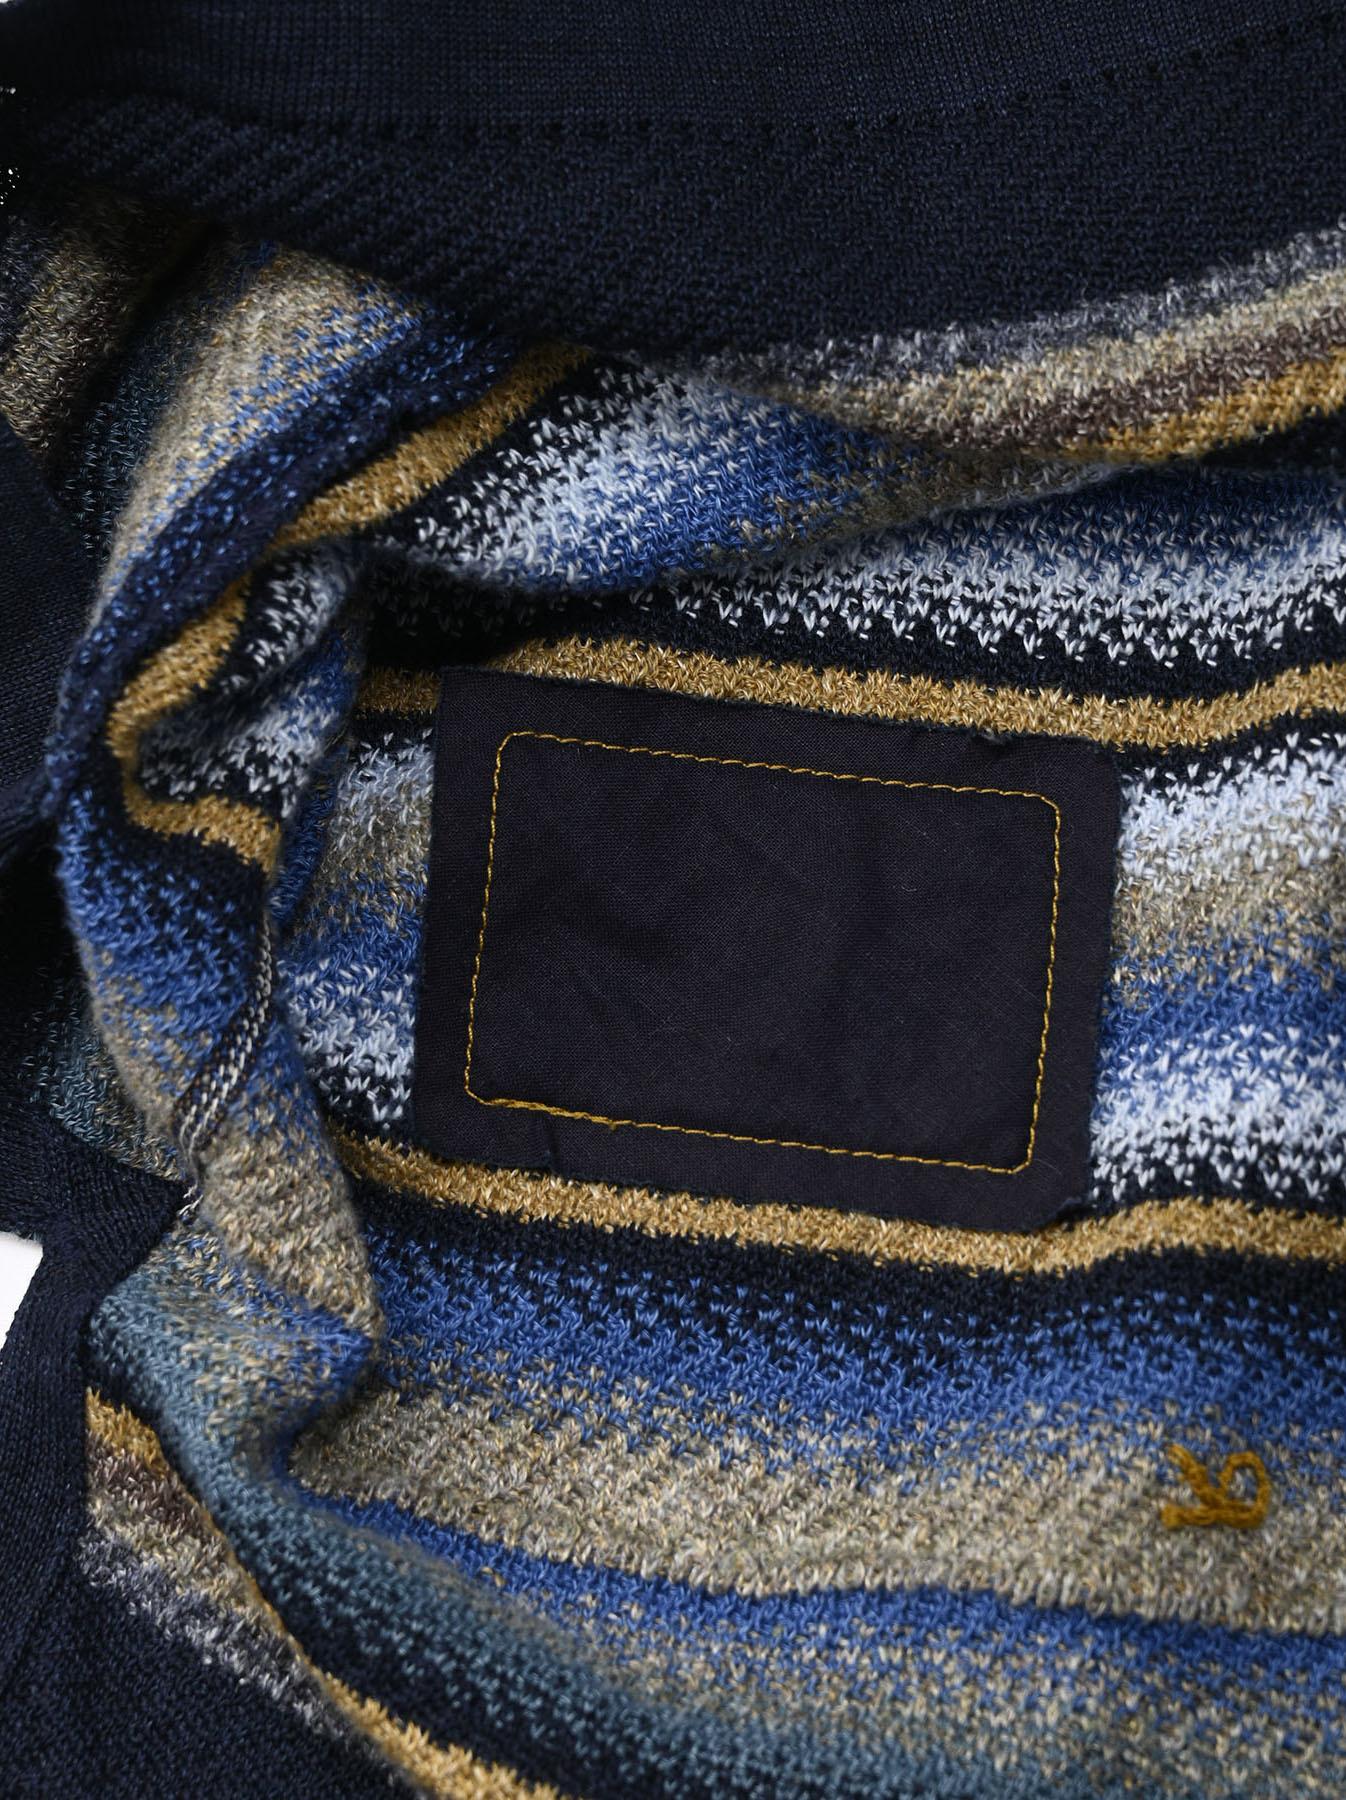 Indigo Rainbow Stripe Knit-sew 908 Umahiko Hoodie (0721)-12